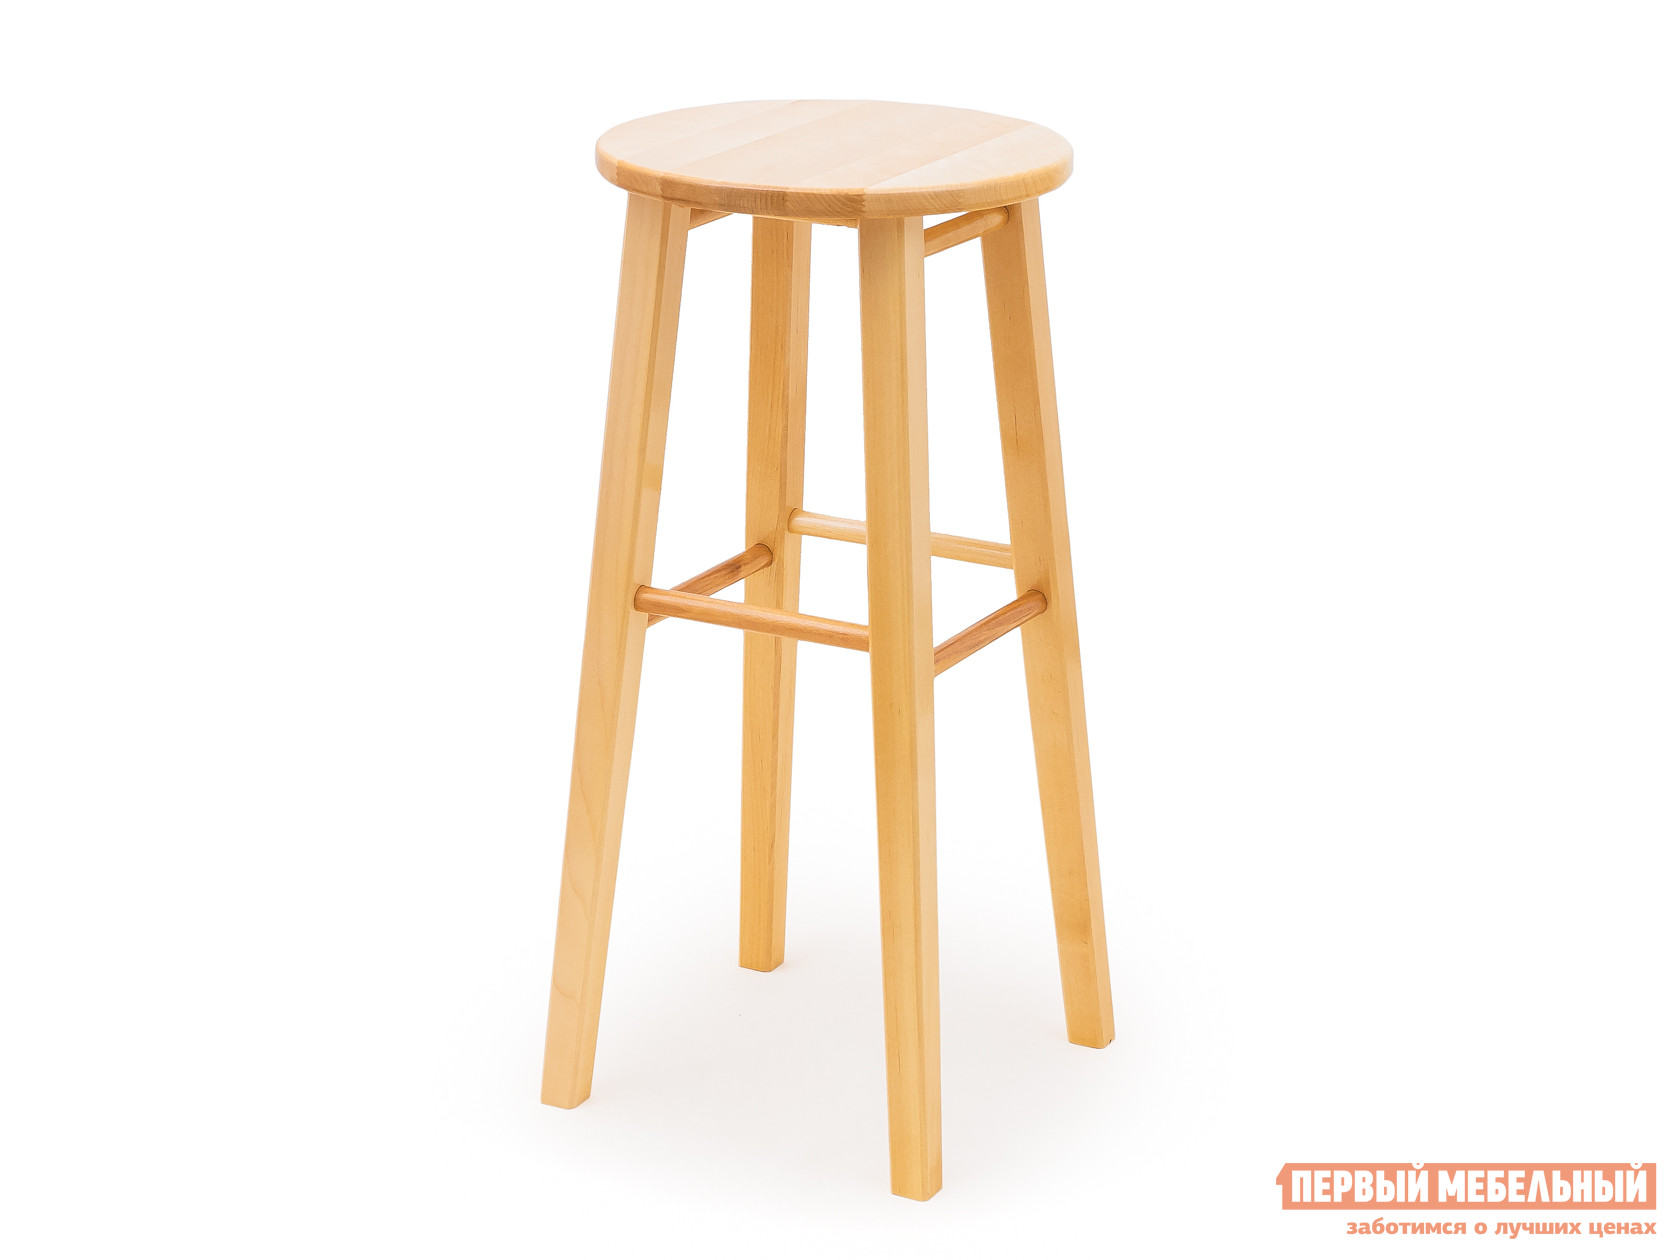 Барный стул СМКА КМ023Б Береза, 650 мм от Купистол